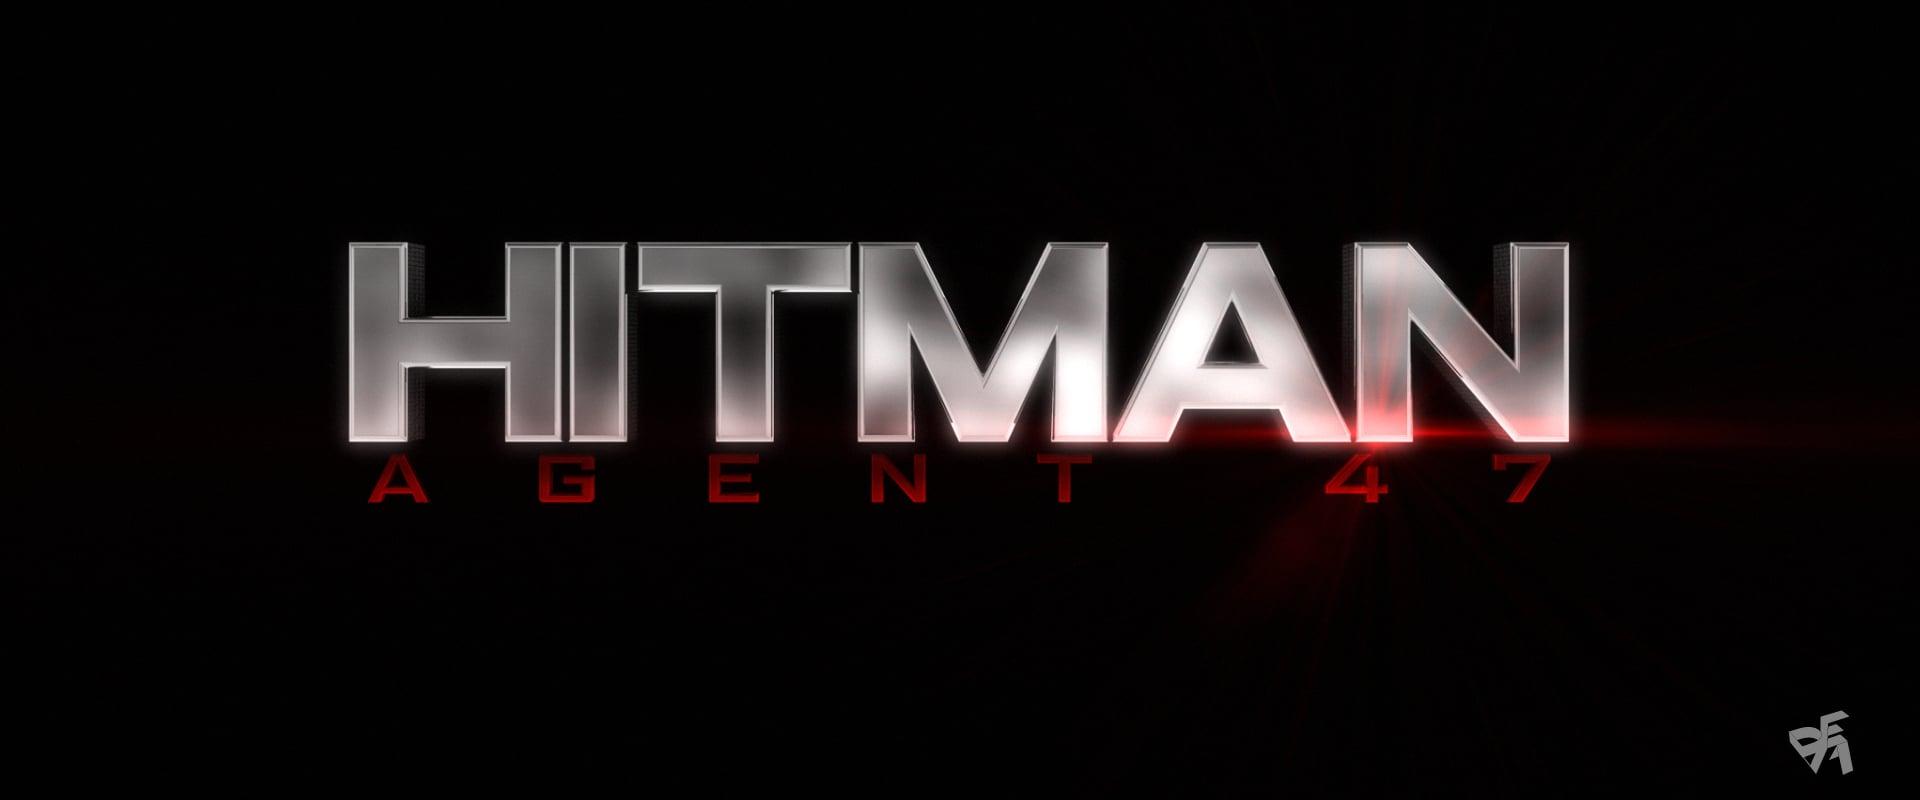 Hitman-STYLEFRAME_01.jpg